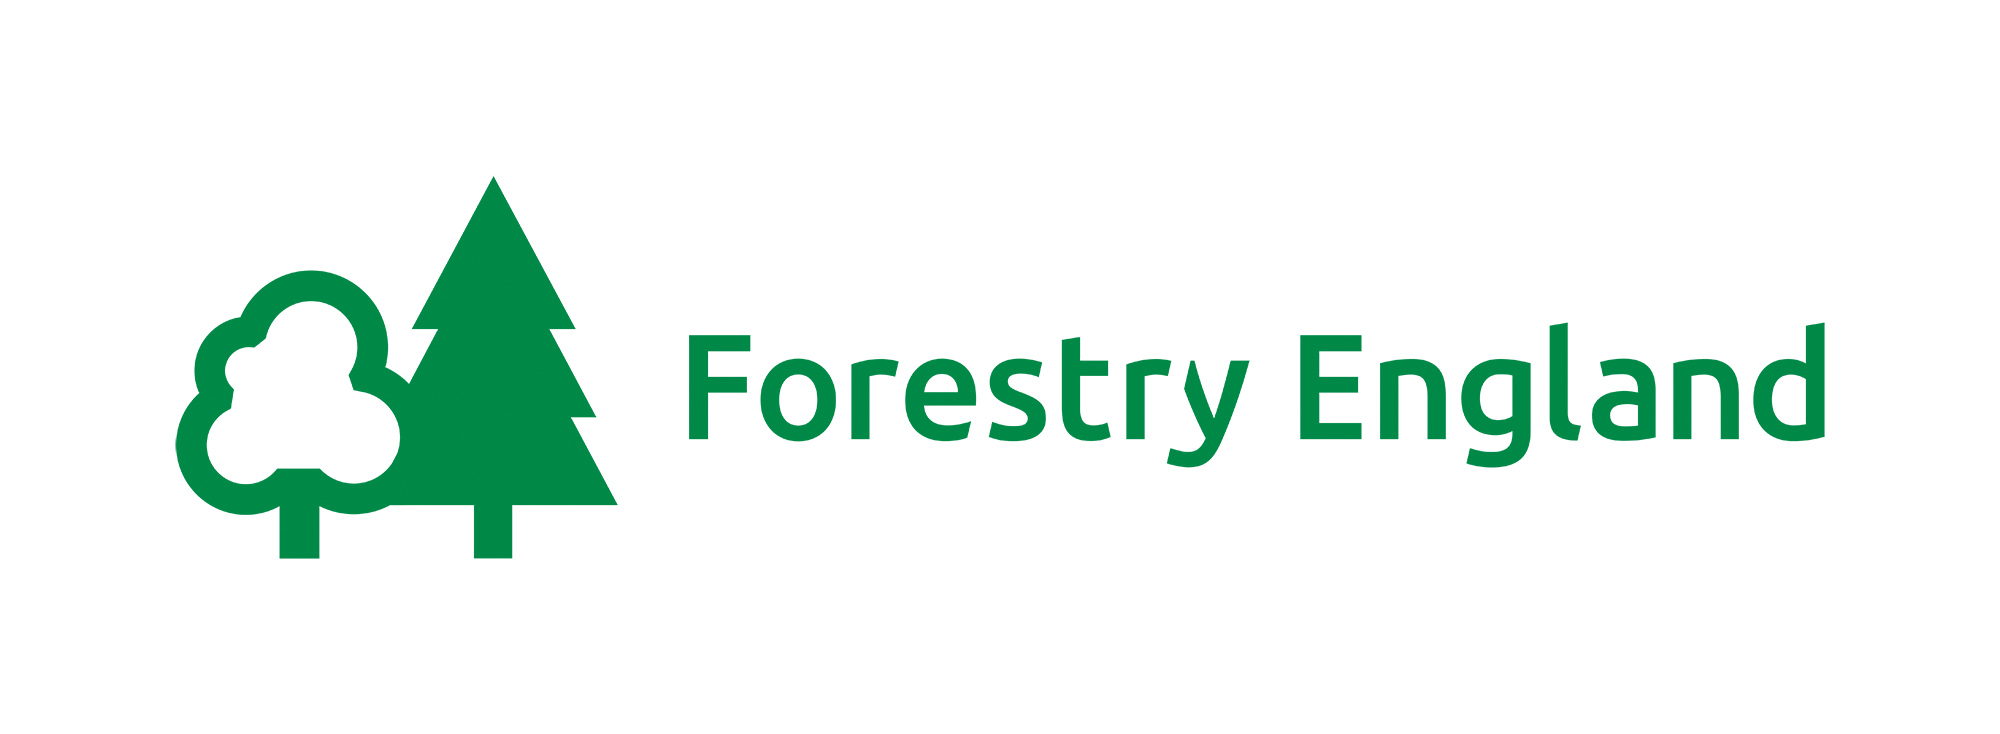 FE digital logos_FE_Primary_Logo_Green.jpg